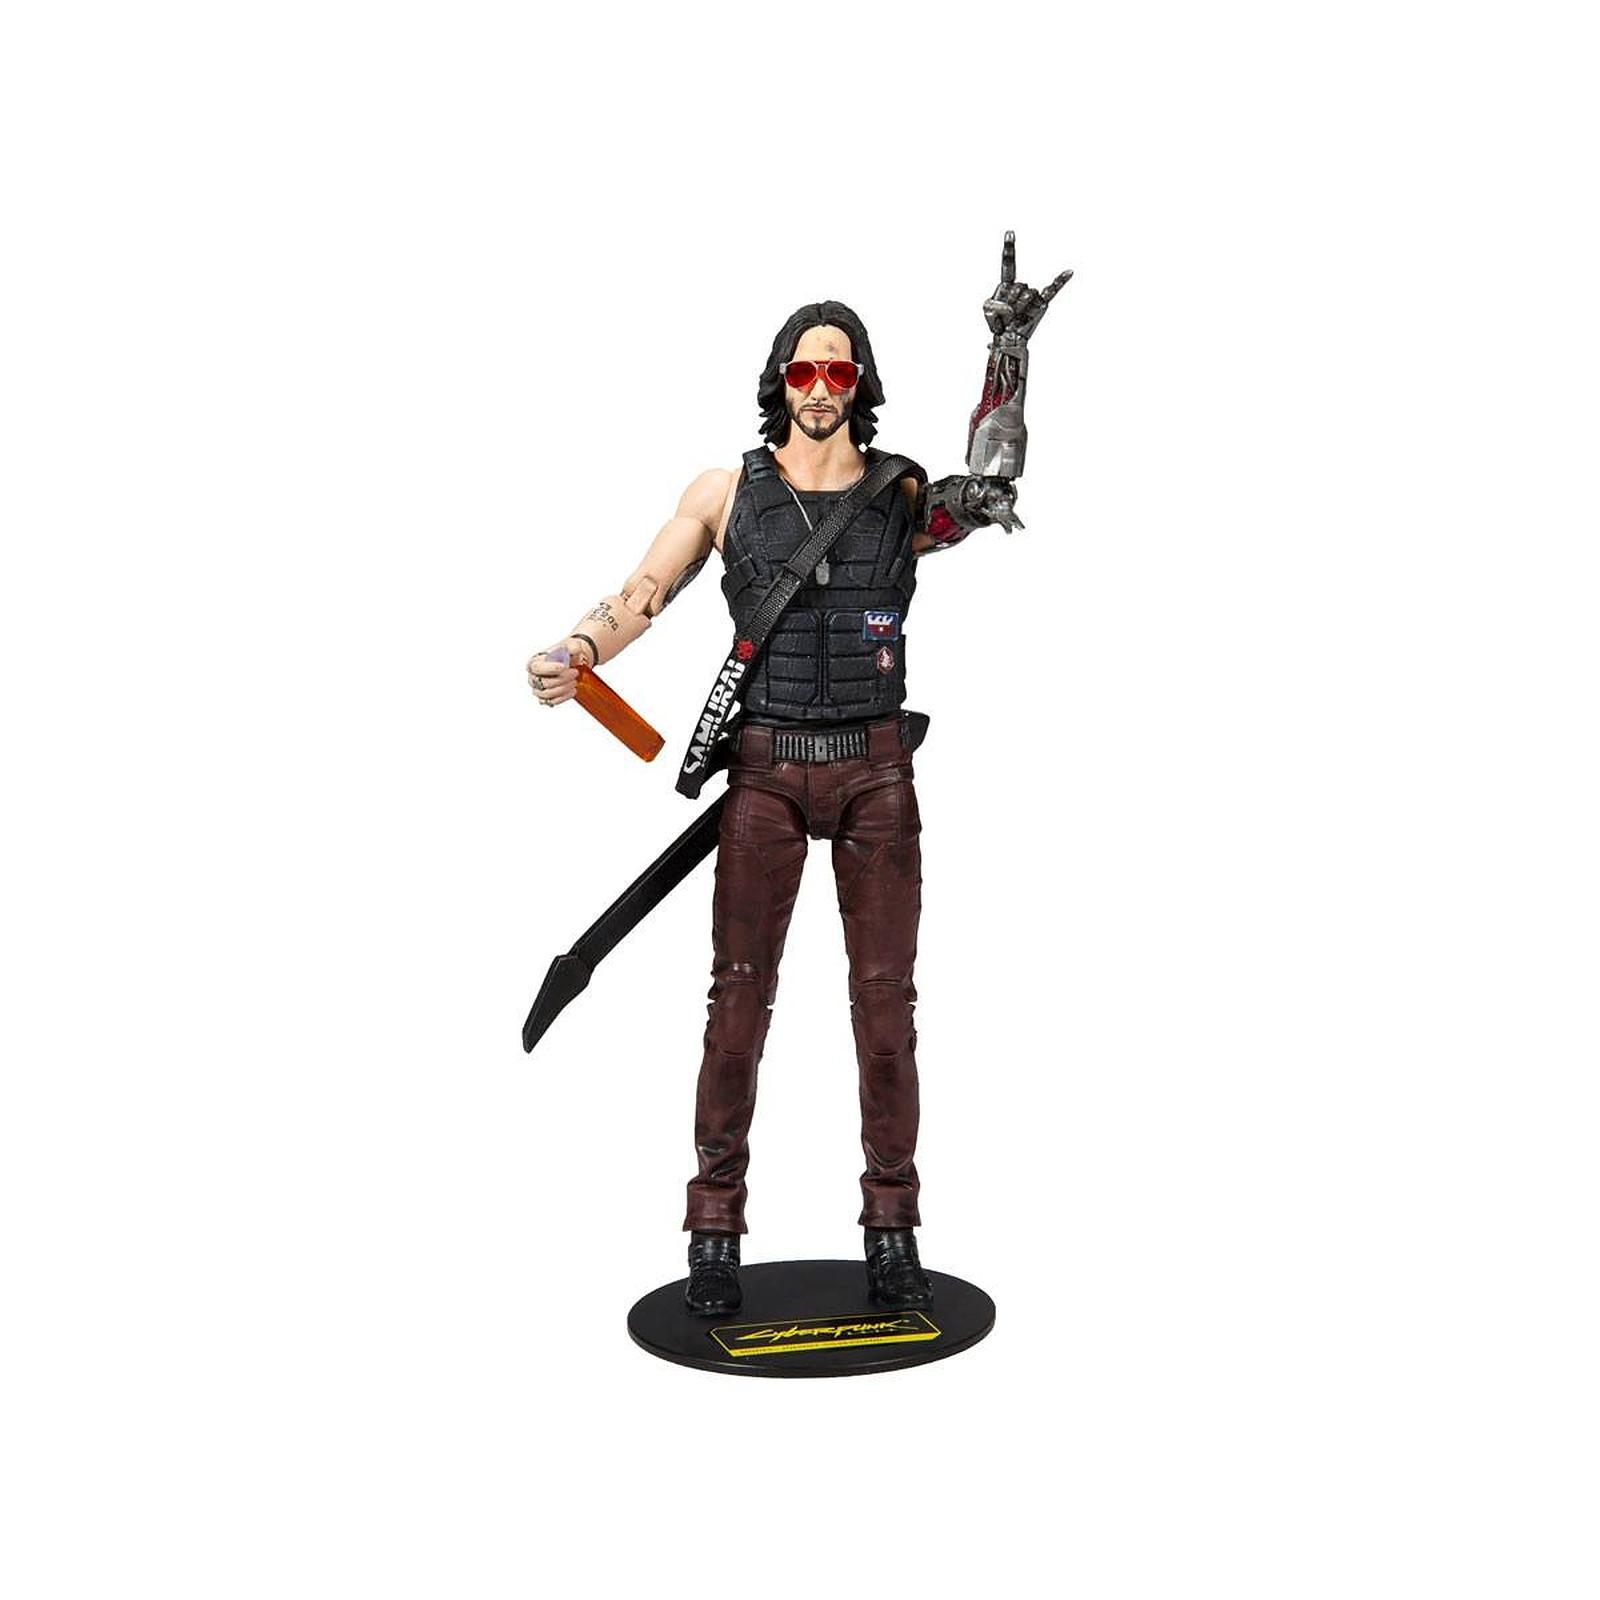 Cyberpunk 2077 - Figurine Johnny Silverhand 18 cm